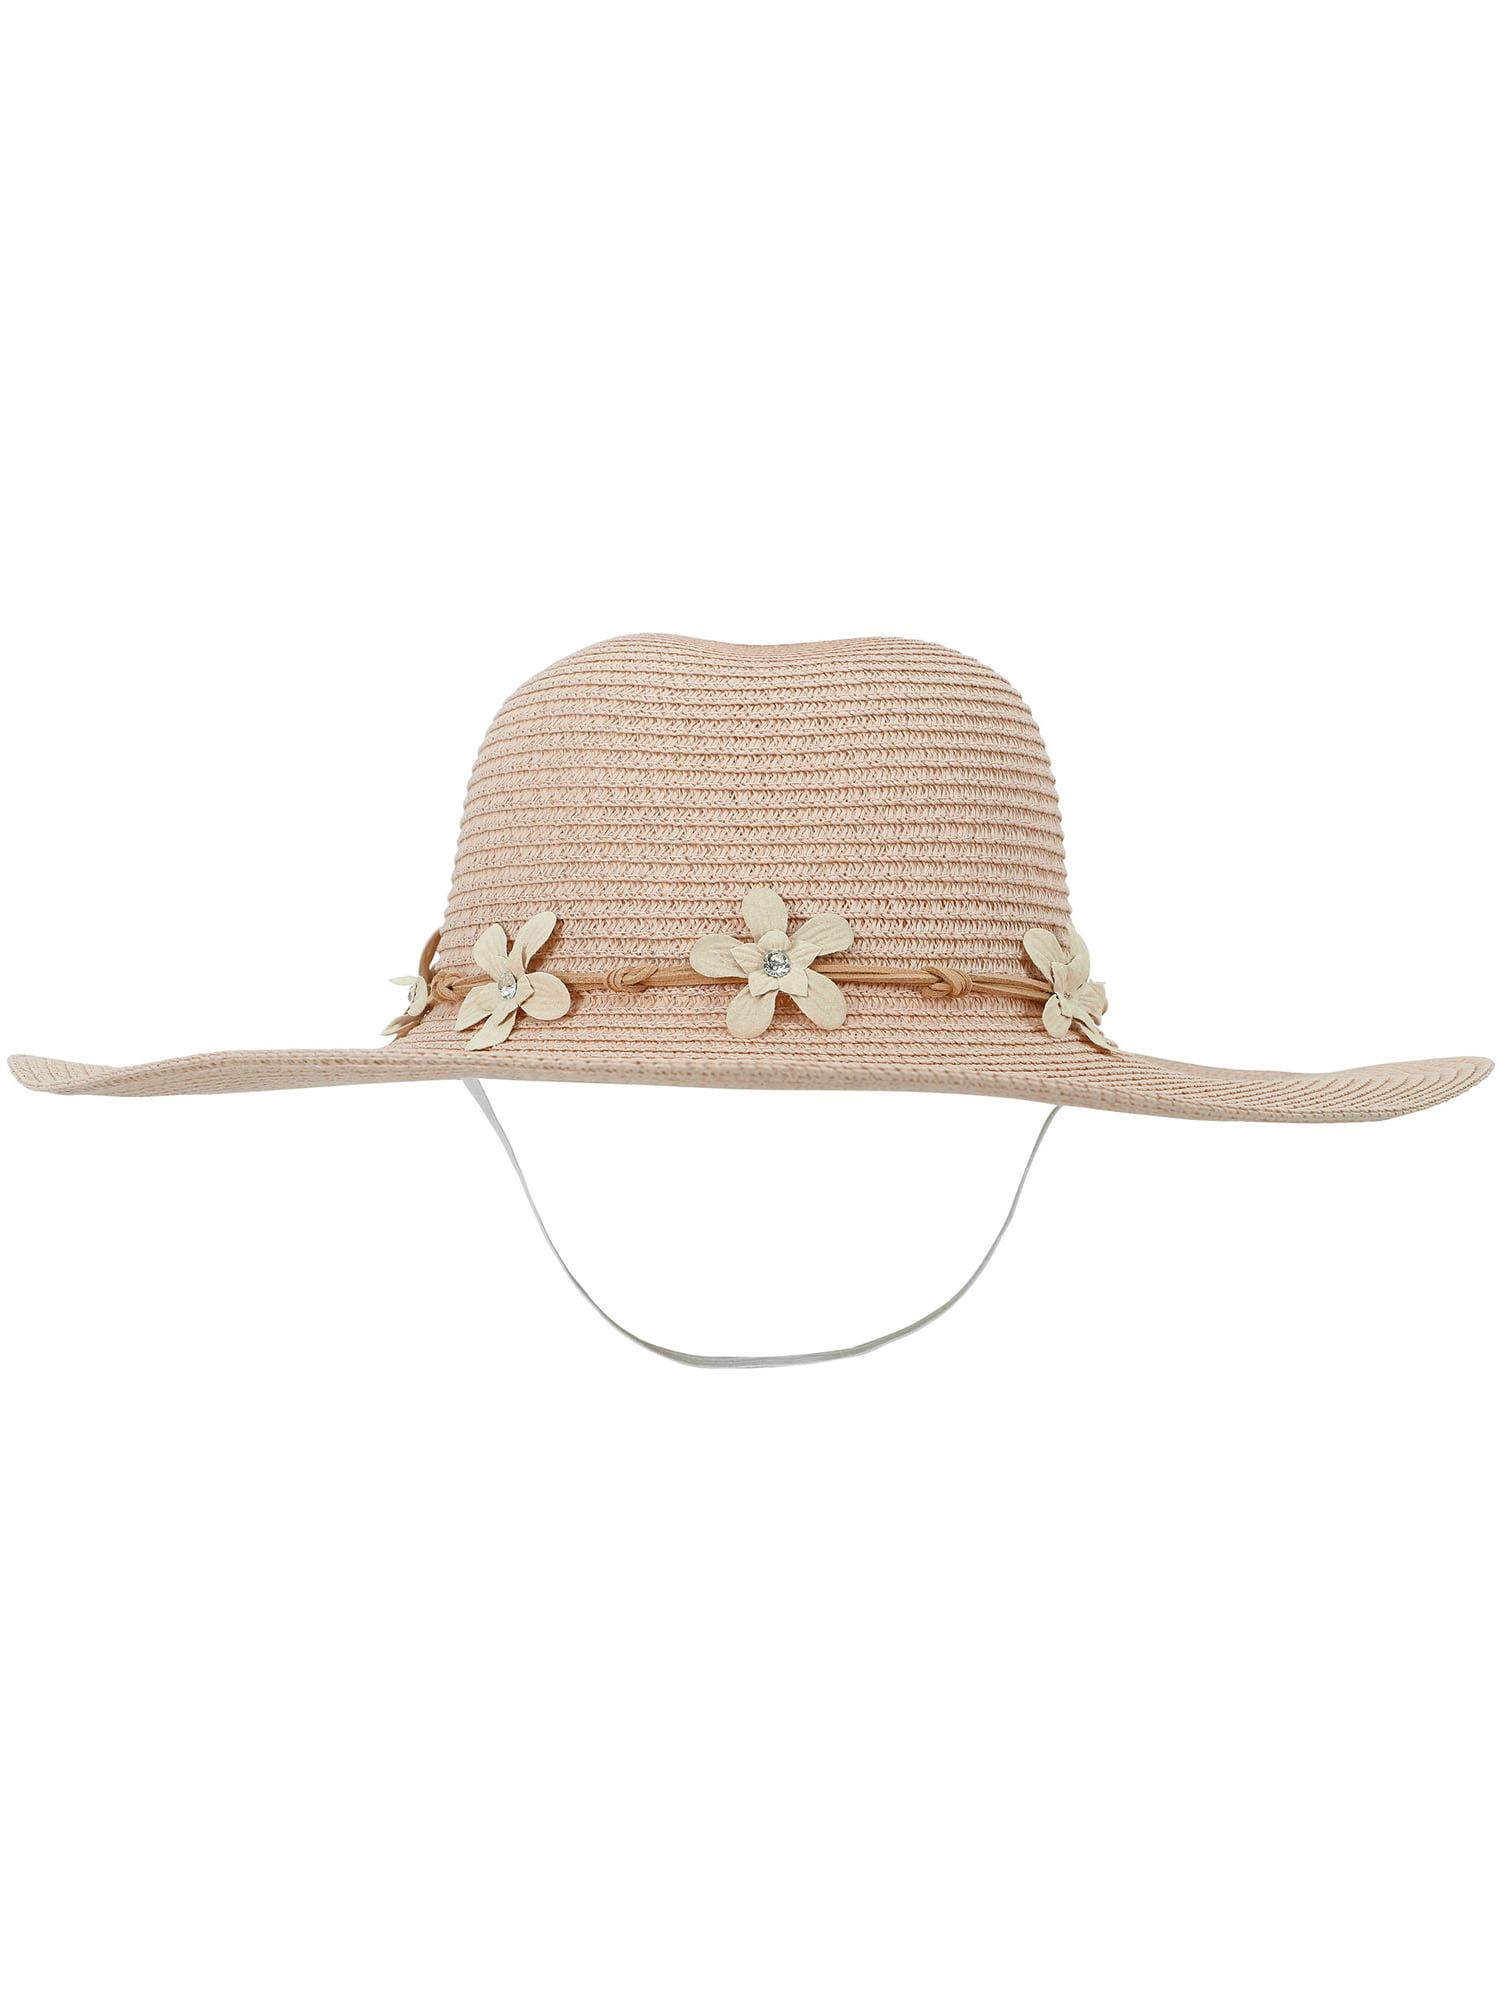 b6b6c99bcf87e6 AshopZ - Women's Summer Wide Brim Straw Sun Hat w/ Chin Strap,Pink -  Walmart.com